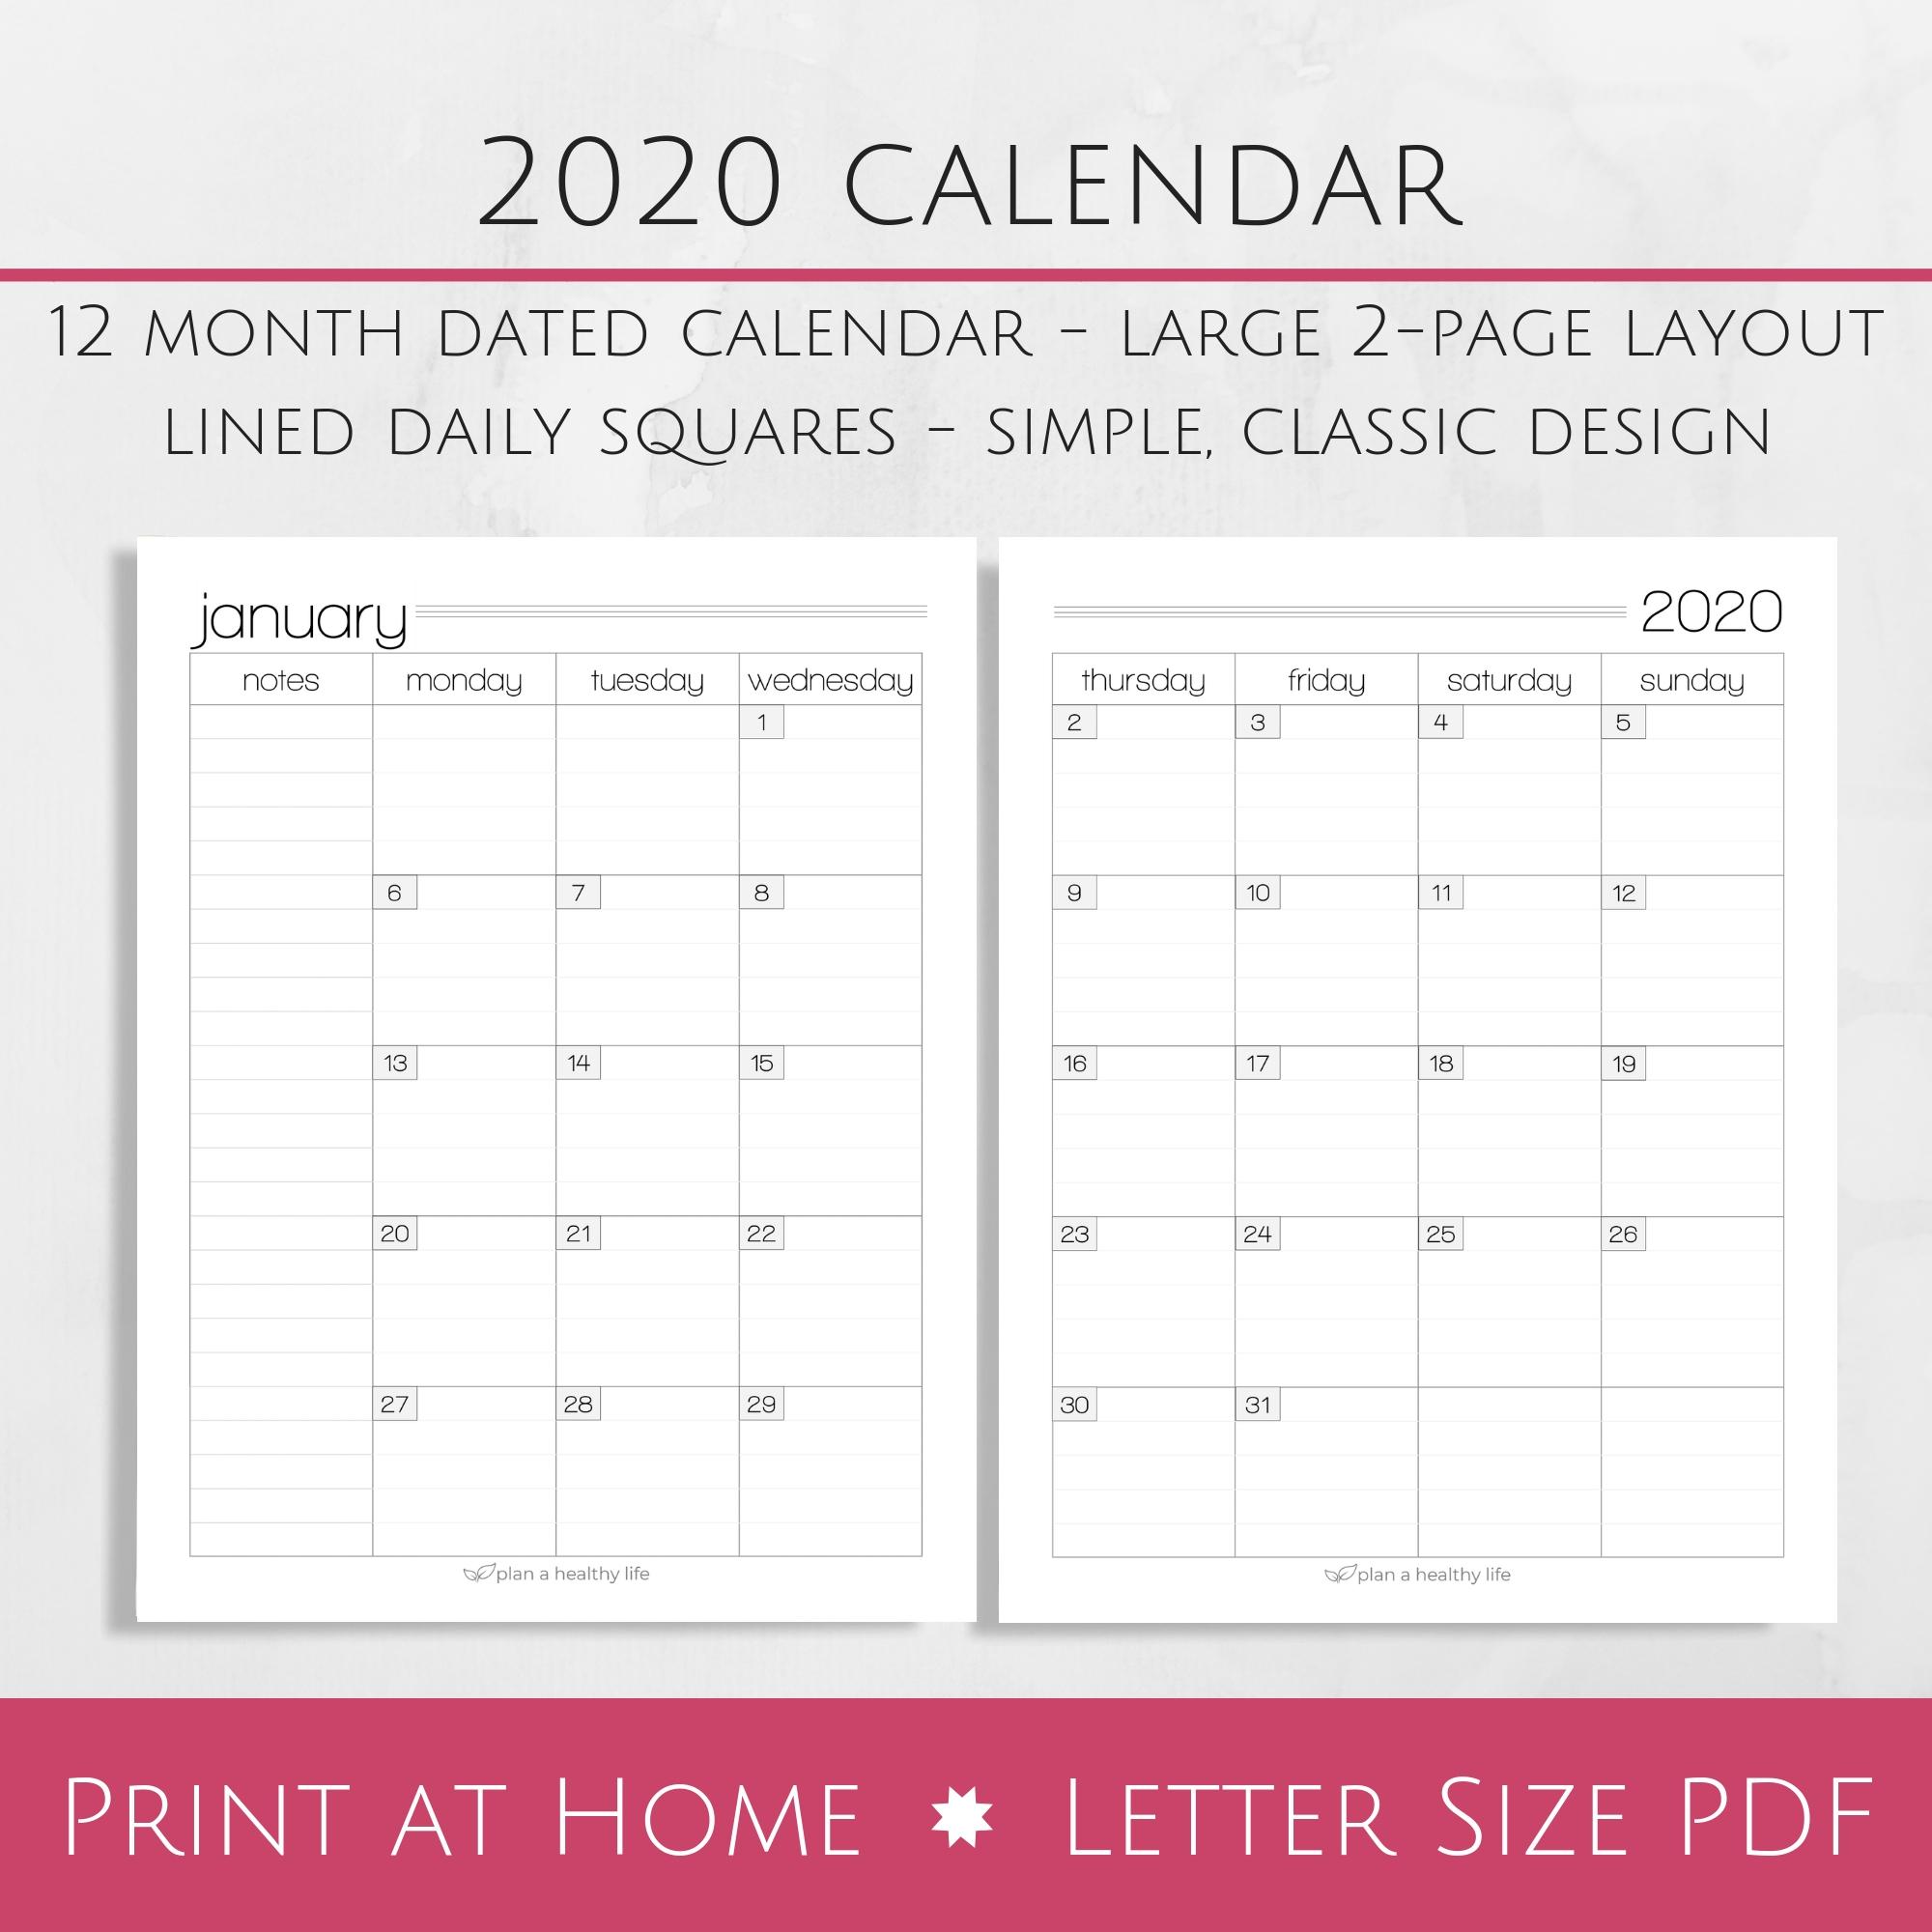 Printable 8.5 X 11 2020 Calendar | Calendar Template Printable Monthly Yearly-8.5 X 11 Calendar Print